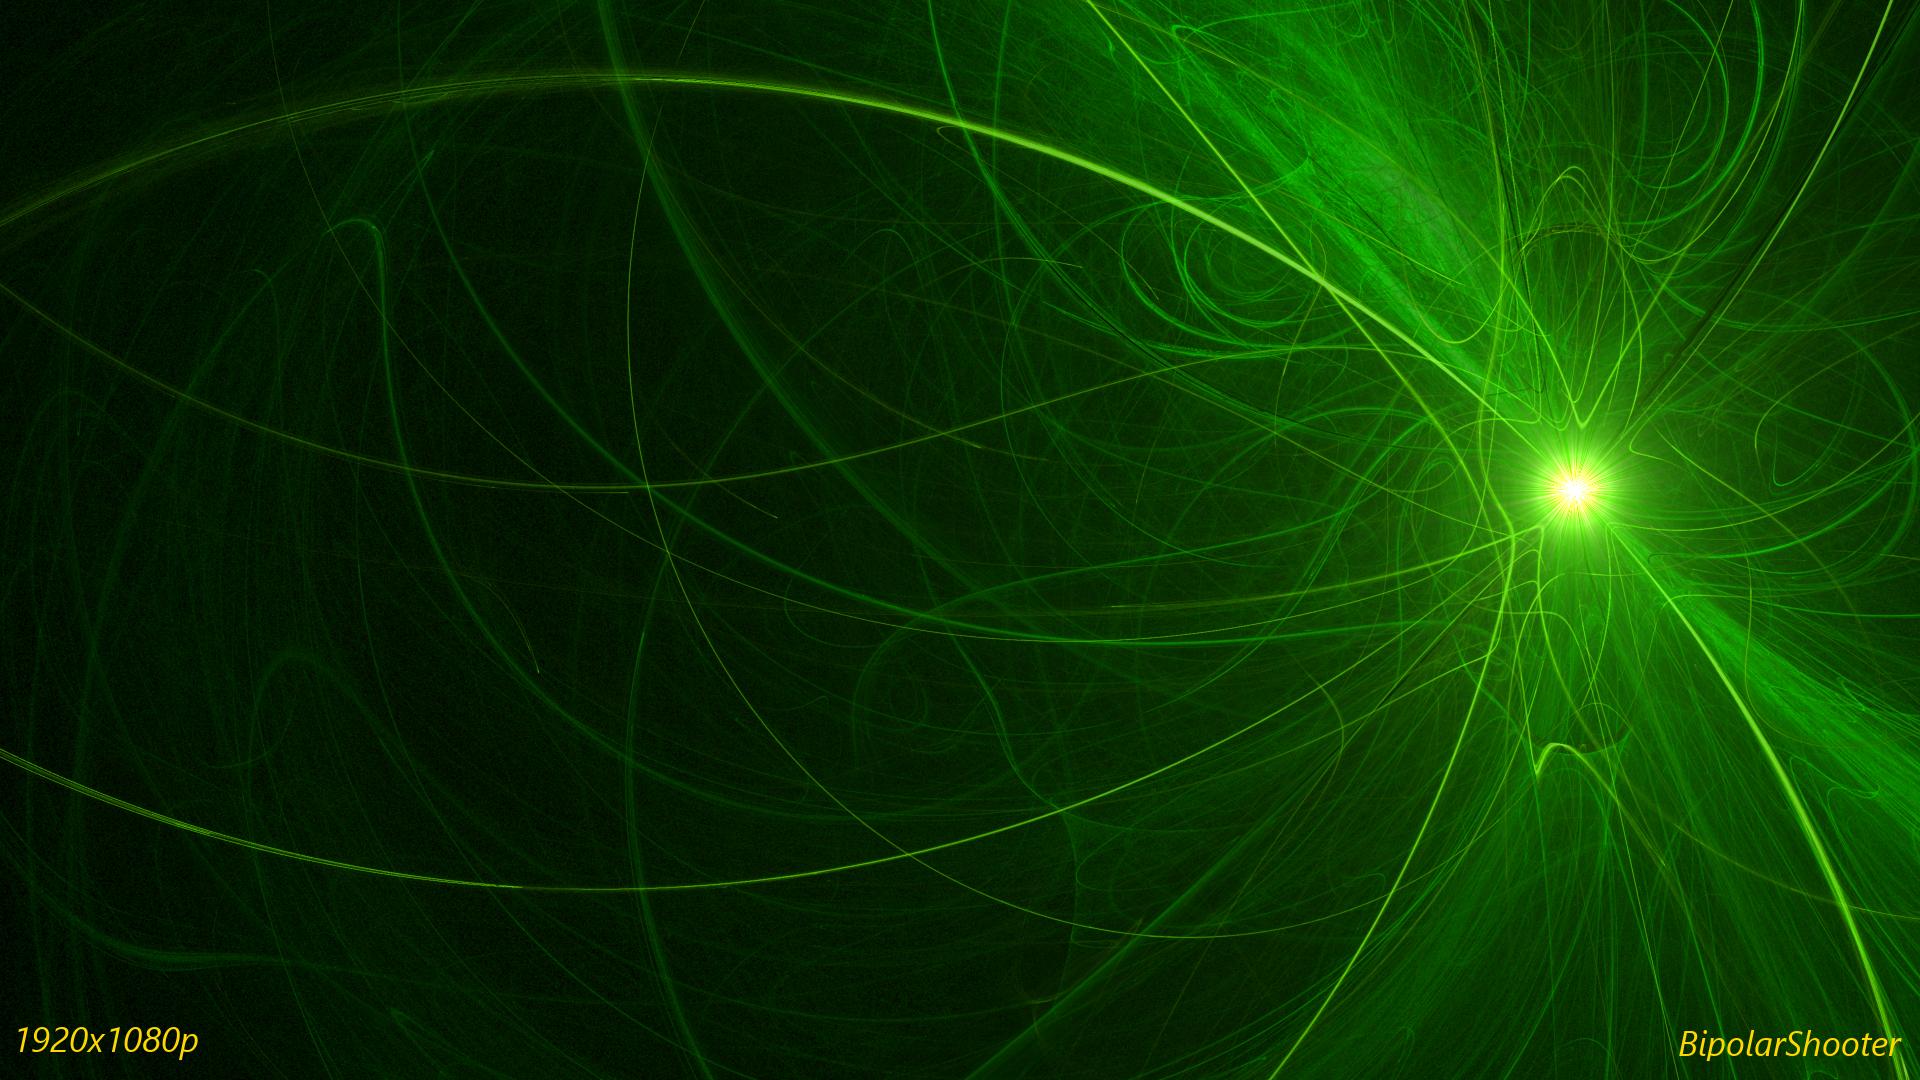 Green emerald wallpaper Wallpaper Experts 1920x1080